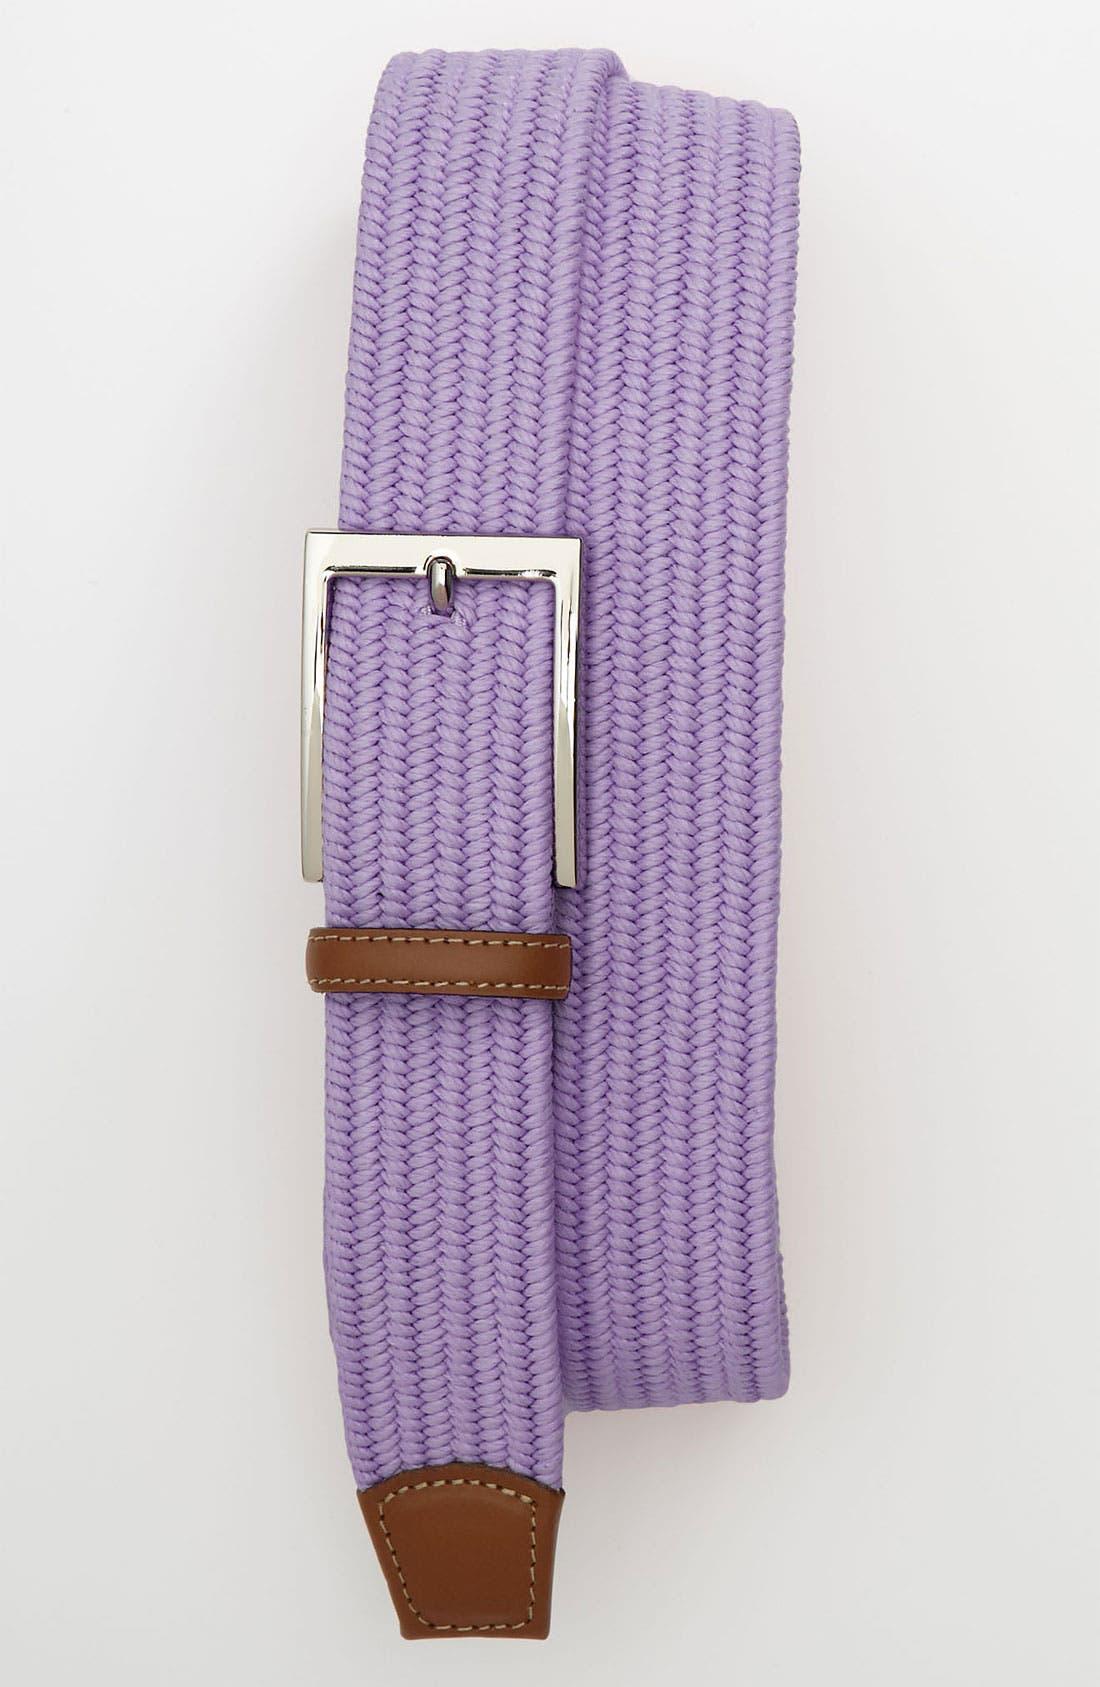 Main Image - Torino Belts Cotton Belt